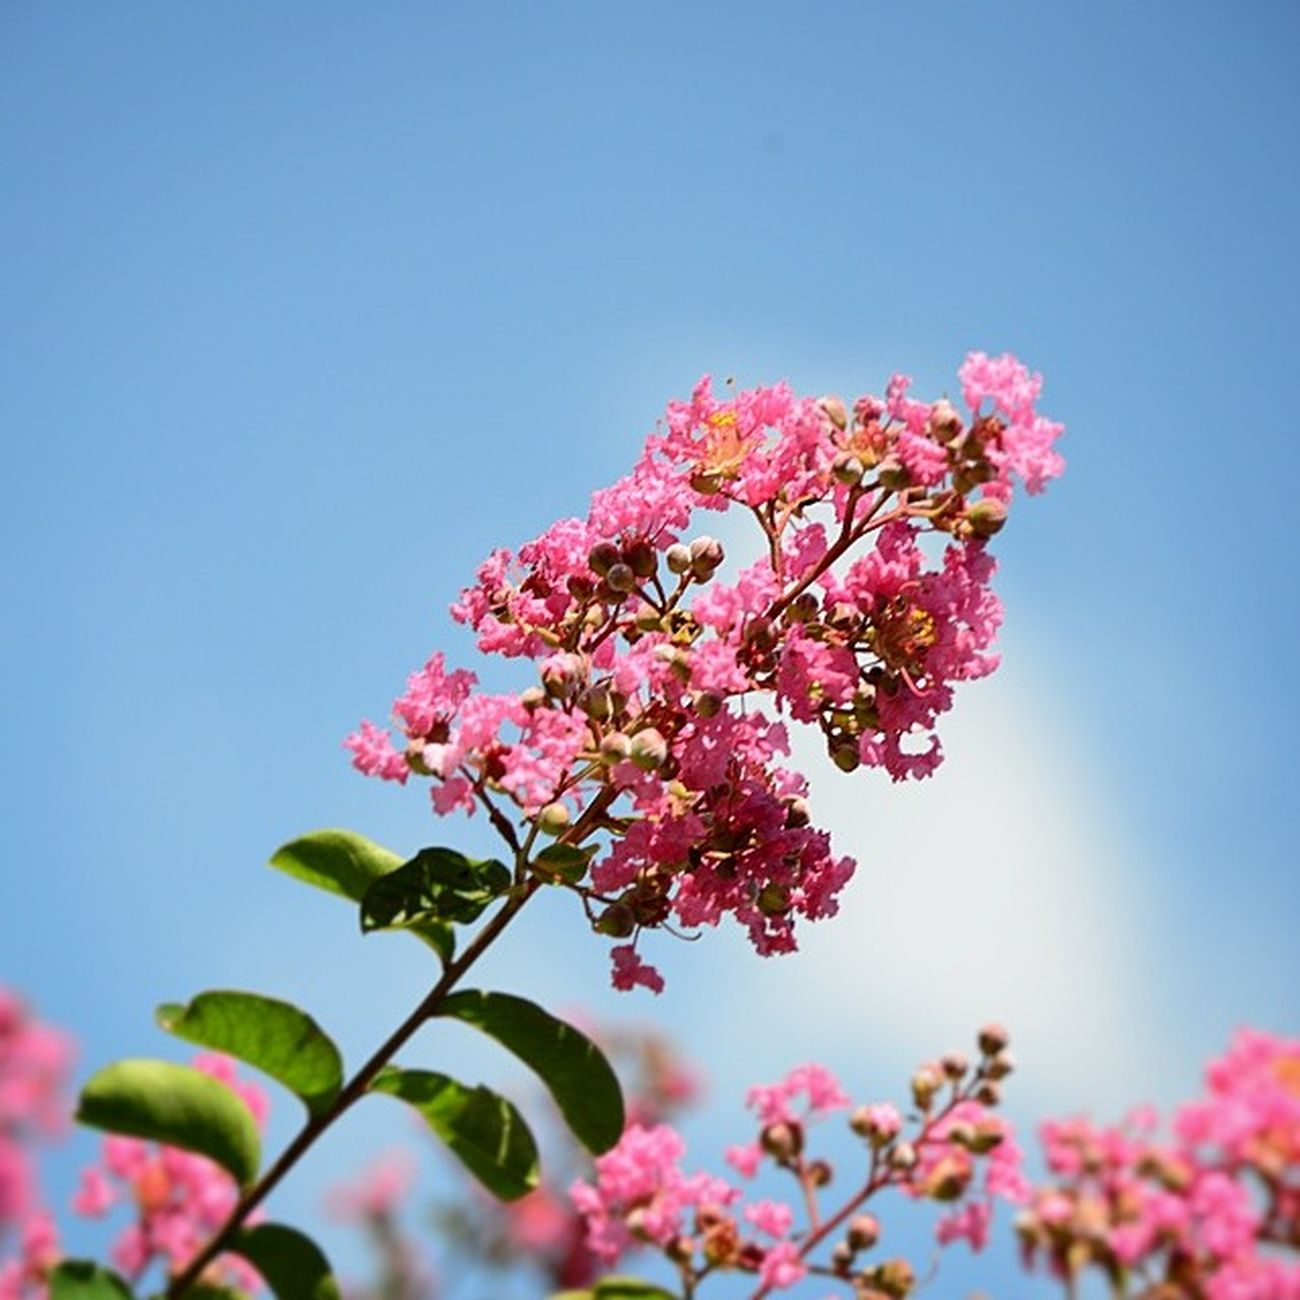 Saü Kampüs! Sau Sau Sakarya Sakaryauniversitesi çiçek flower flowers pic picoftheday photo sky photooftheday photos picture